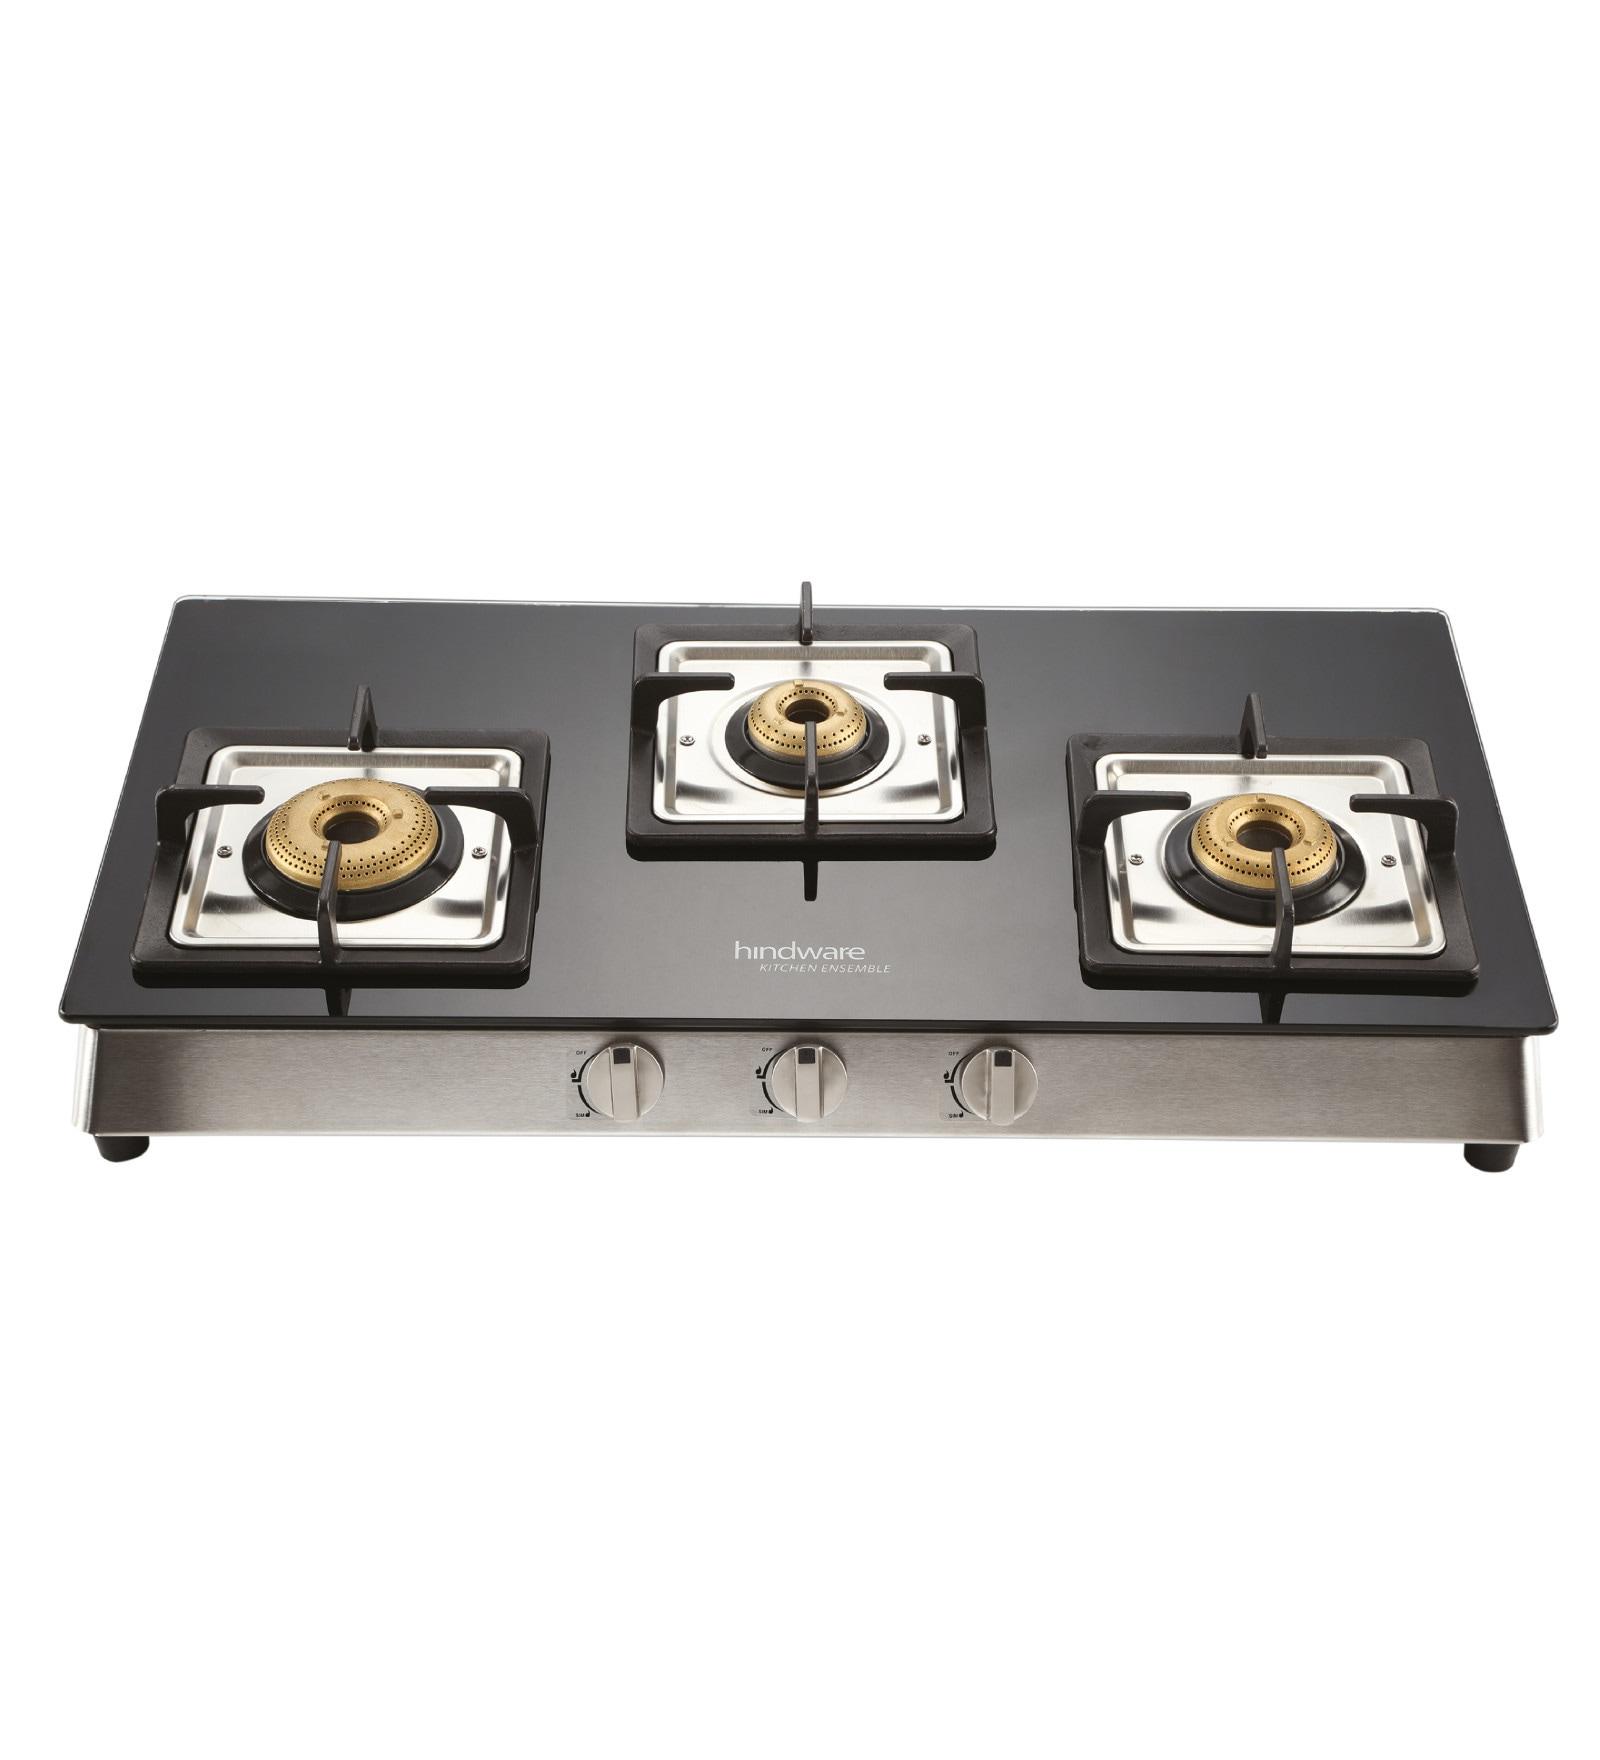 Hindware Lorenzo Glasstop 3 -burner Cooktop